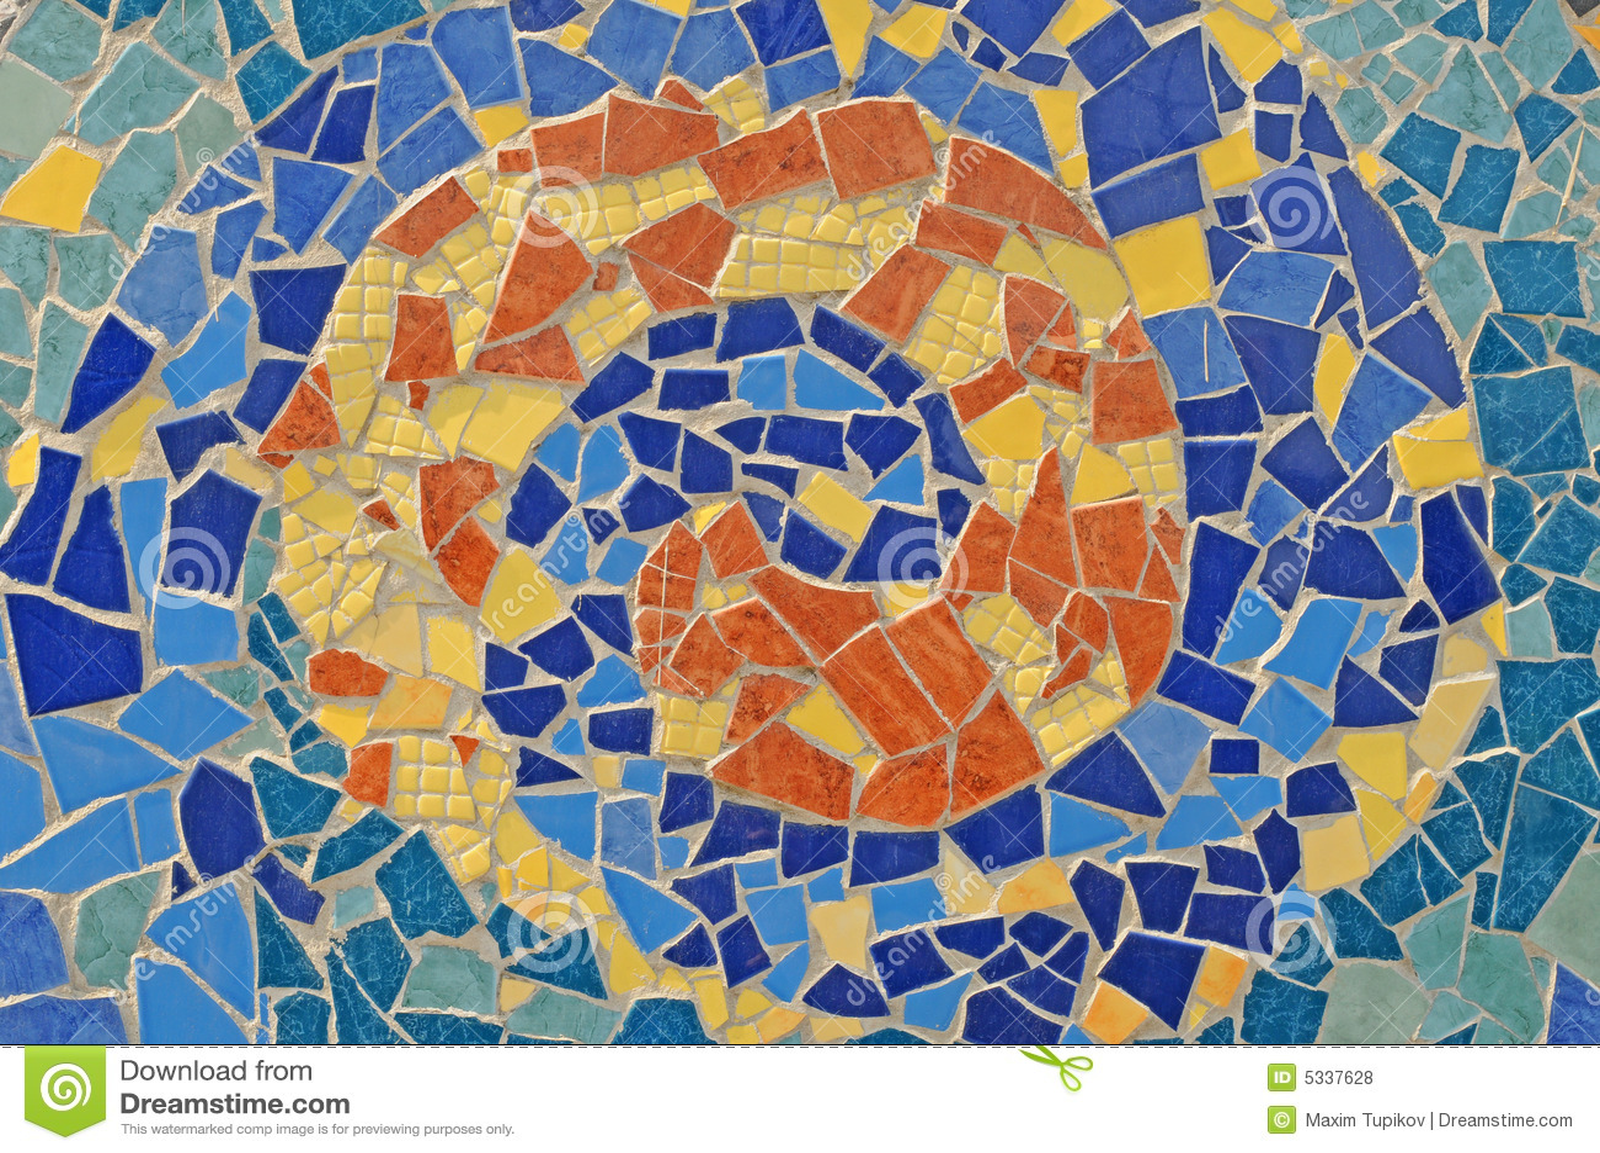 Мозаика из разбитой плитки своими руками